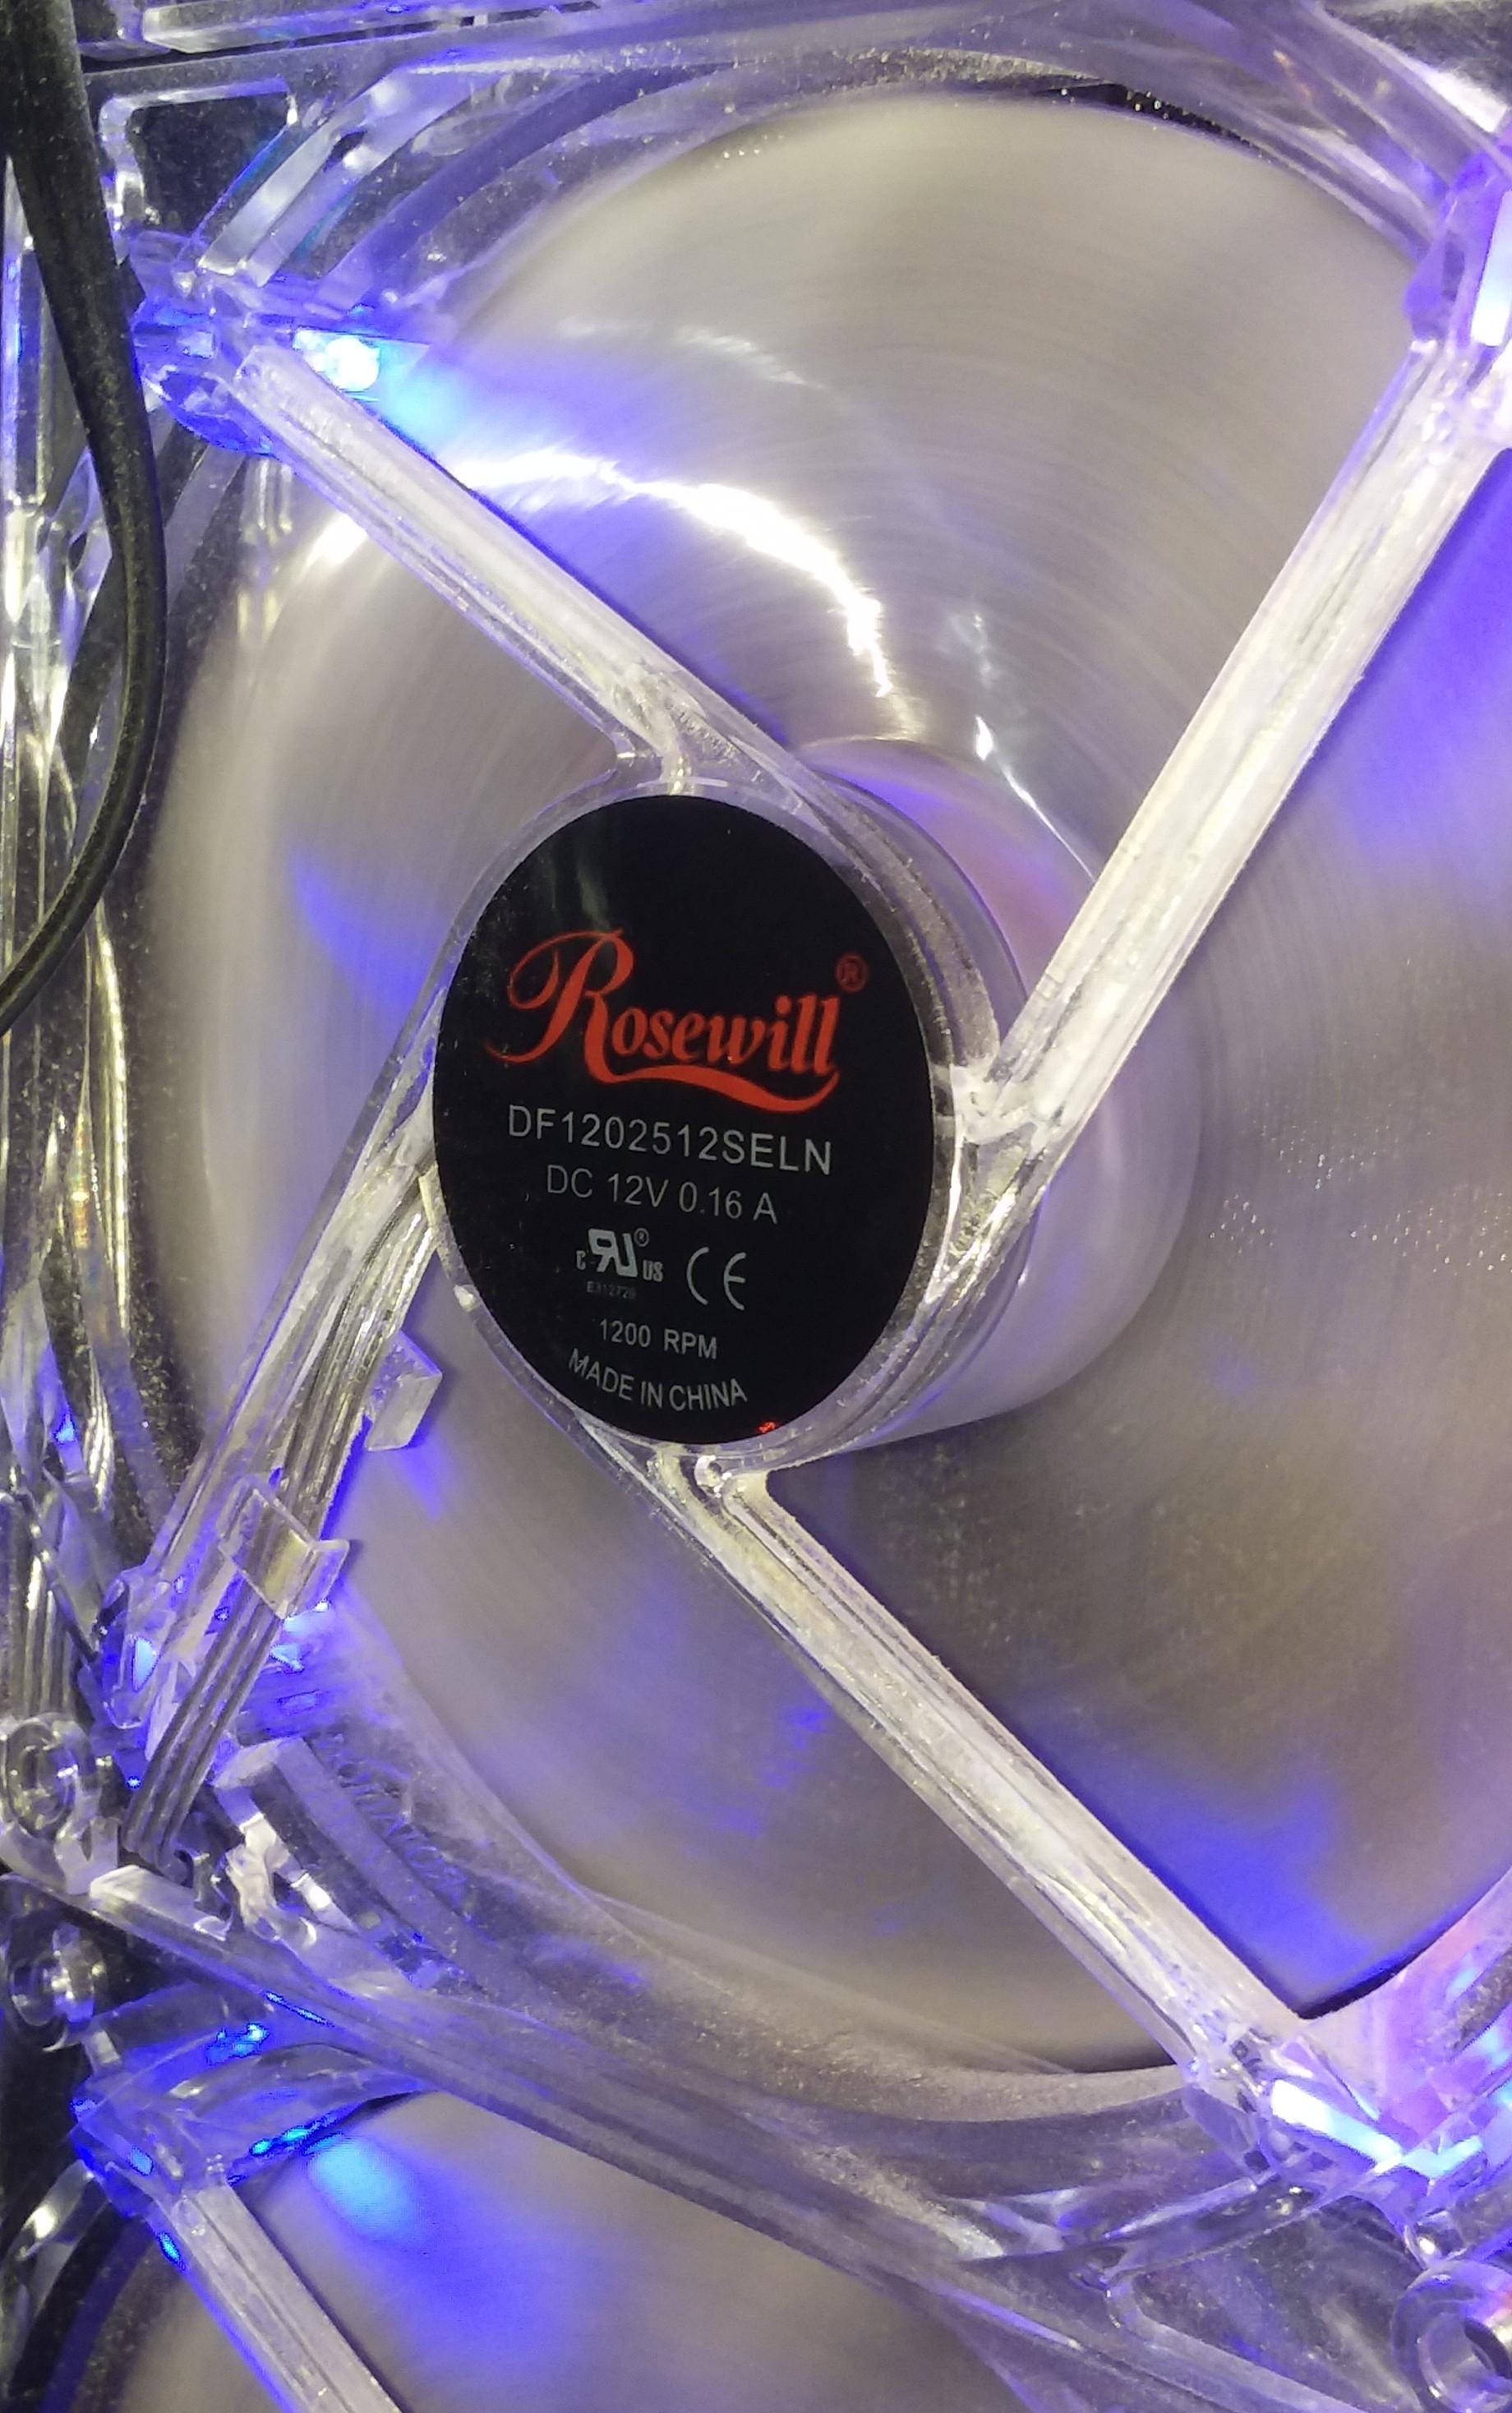 Rosewill-Case-Fan-CloseUp.jpg